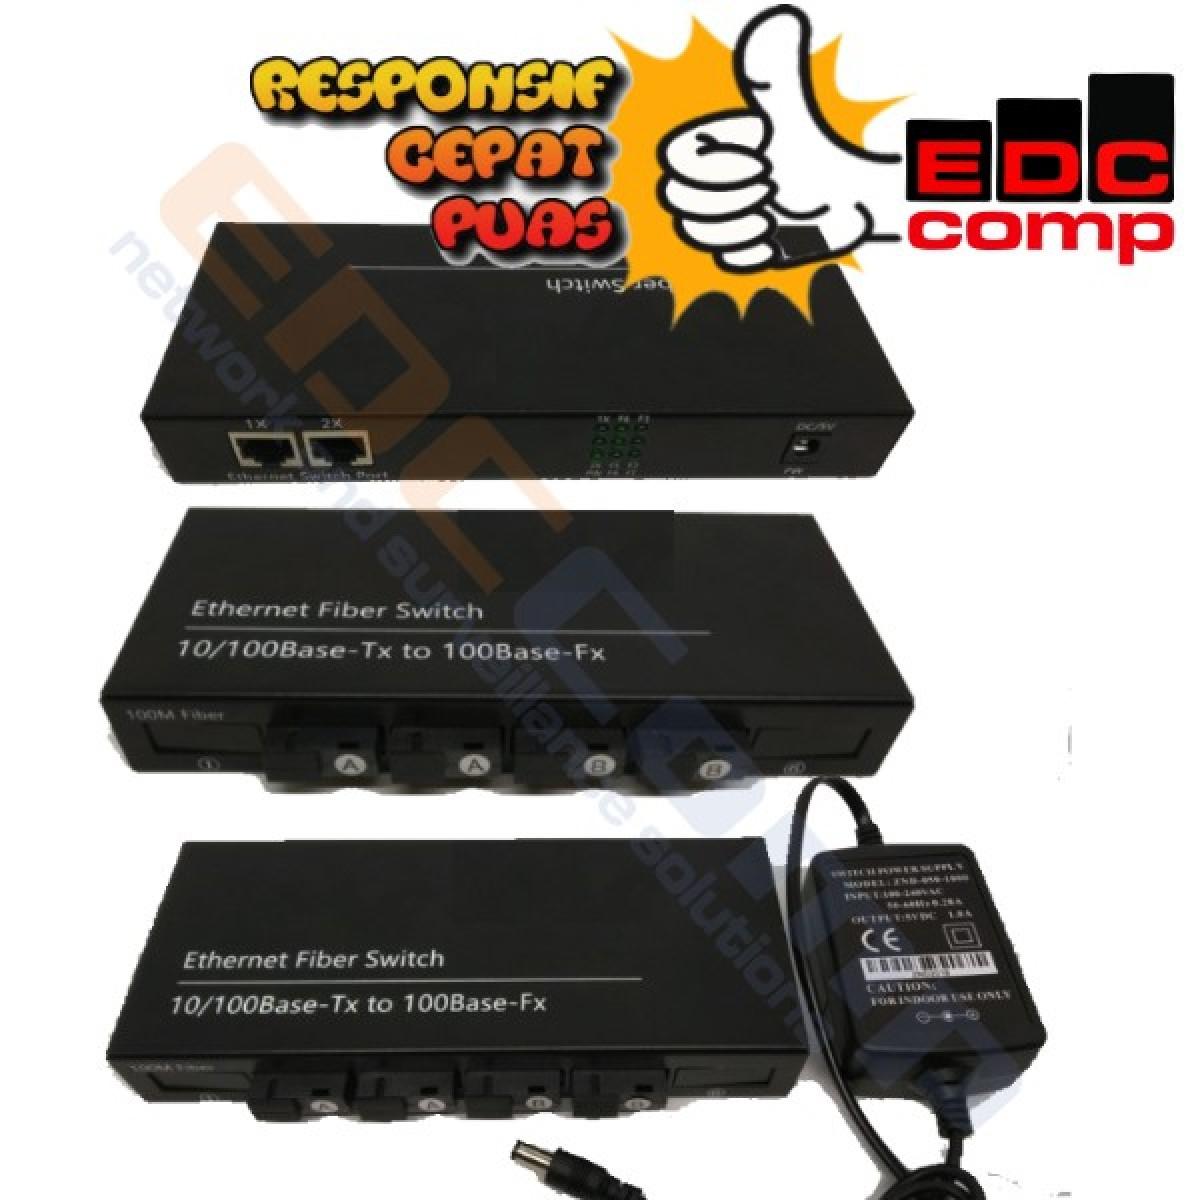 Ethernet Fiber Switch 4 SC 2 LAN /Media Converter Switch FO 4 SC - EdcComp